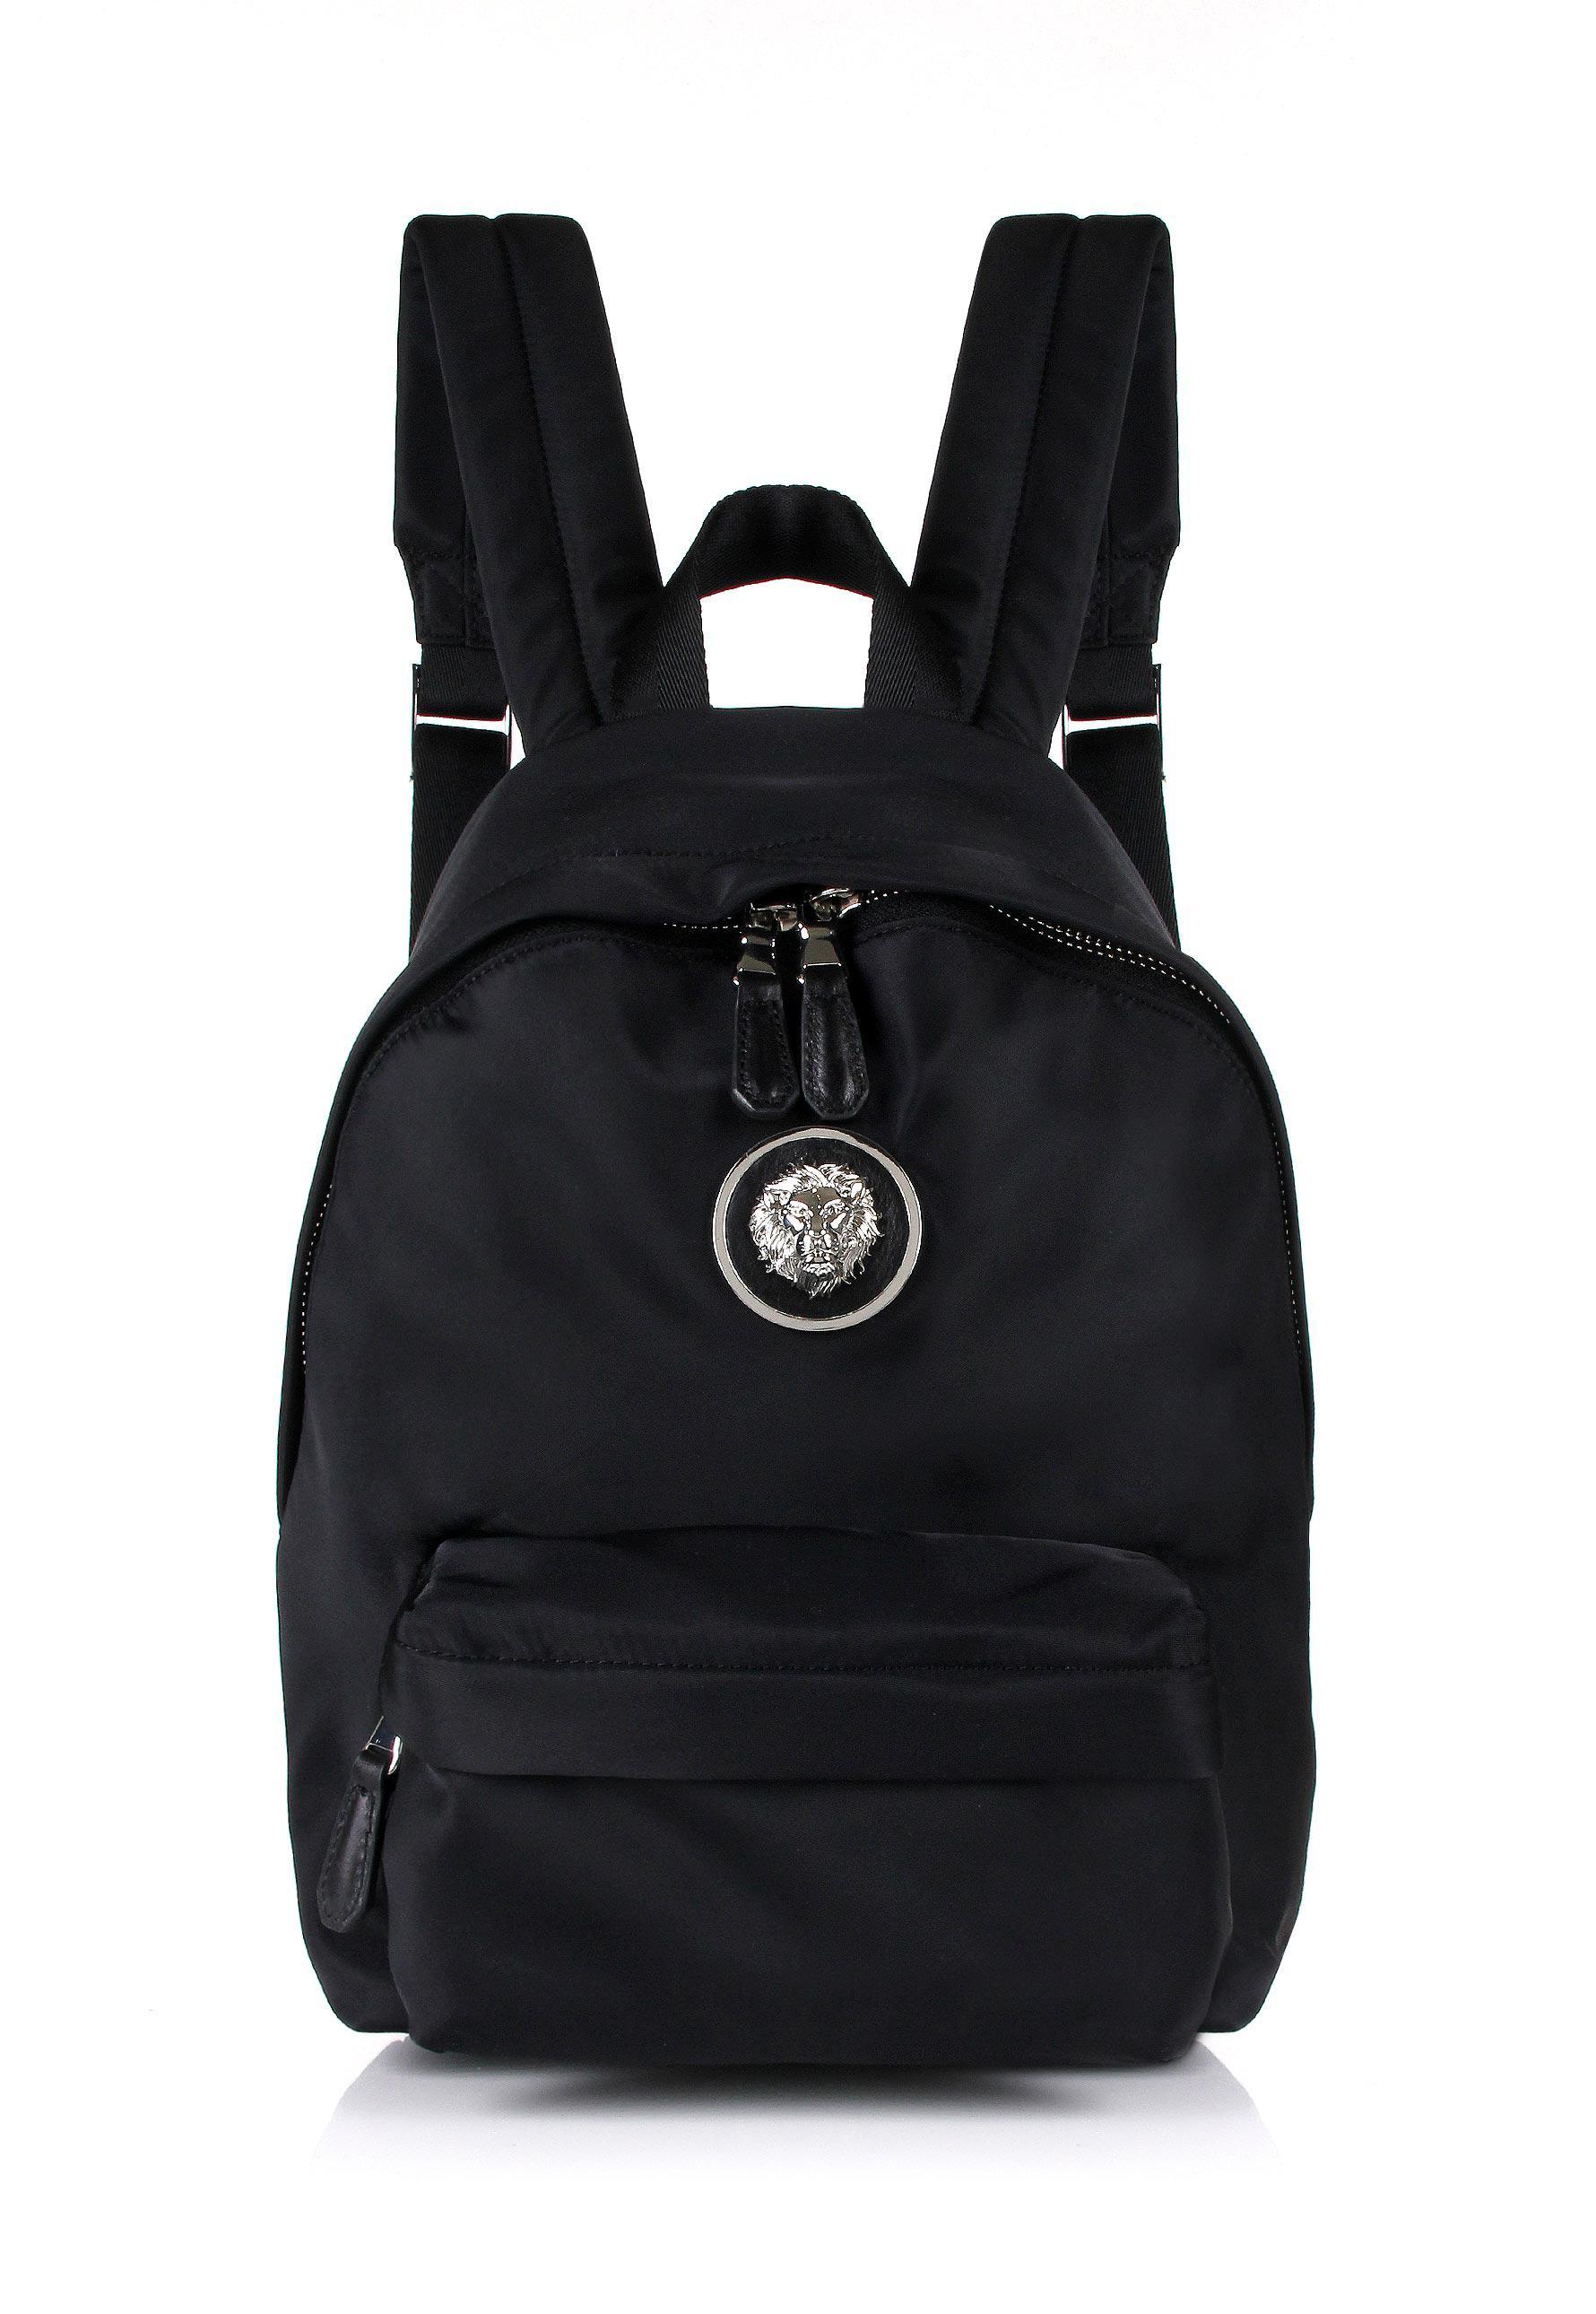 8f938751be47 Versus Small Nylon Lion Head Backpack Black nickel in Black for Men ...